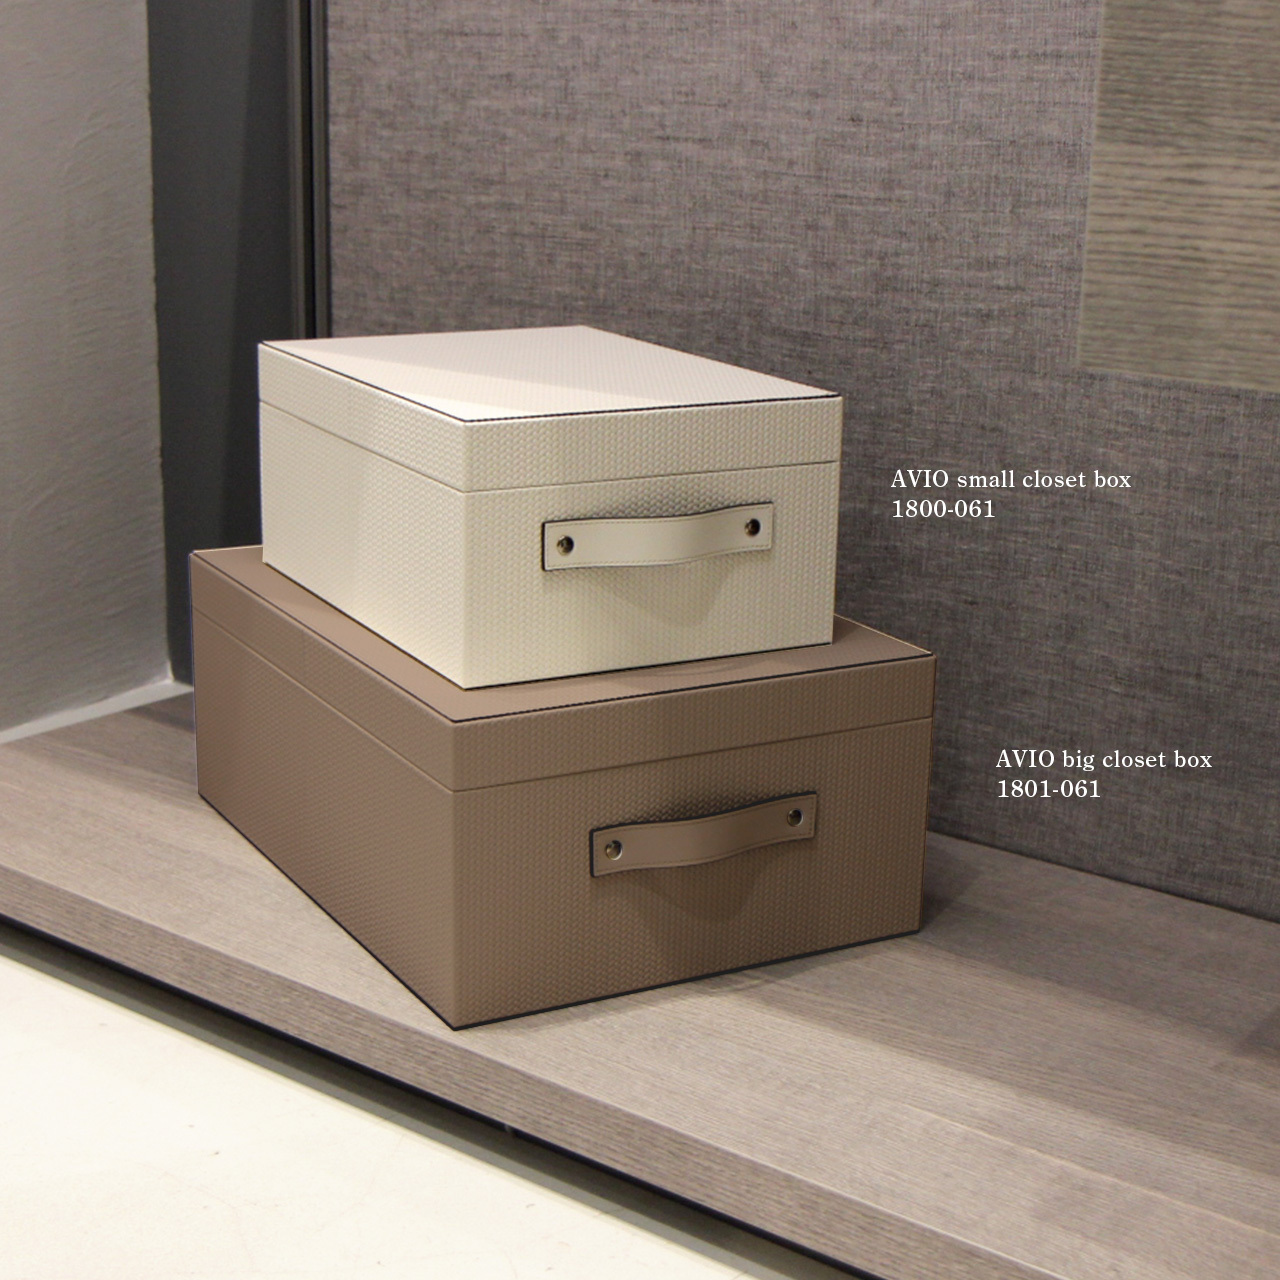 Pinetti AVIO small closet box / Firenze(ピネッティアビオスモールクローゼットボックス/フィレンツェ)1800-061